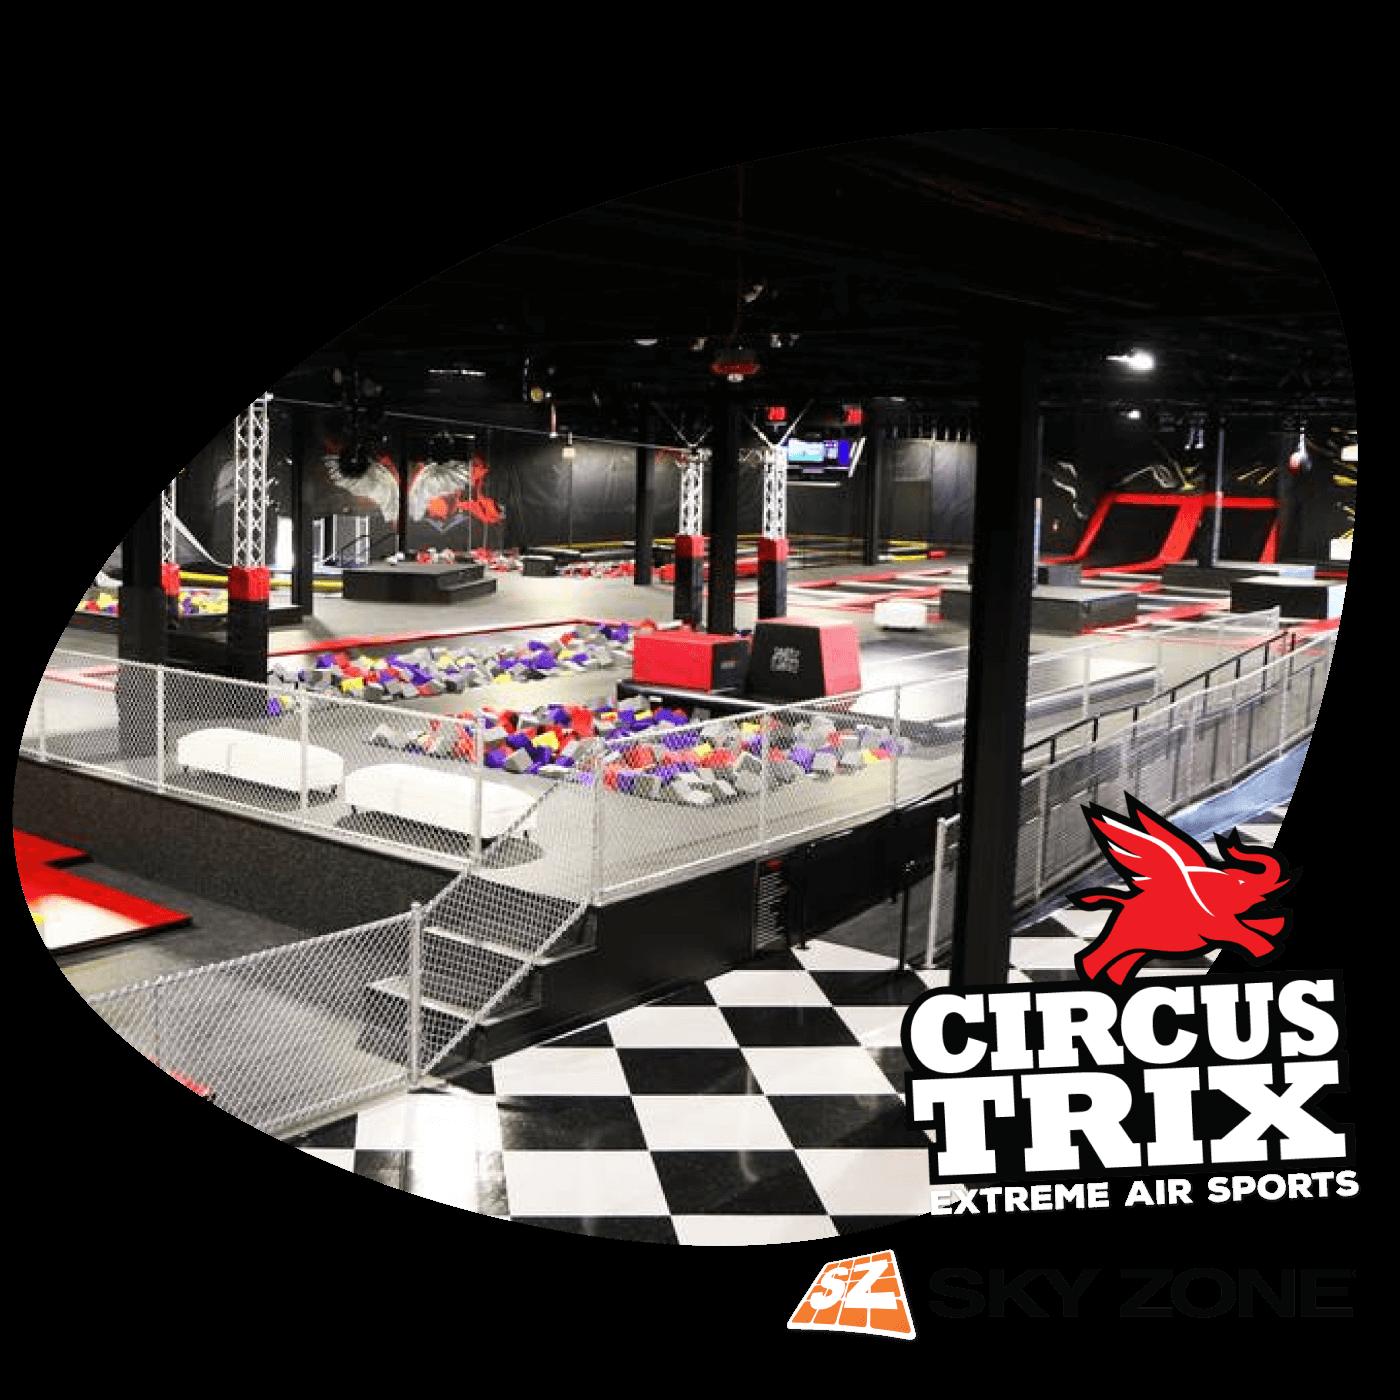 circus trix skyzone